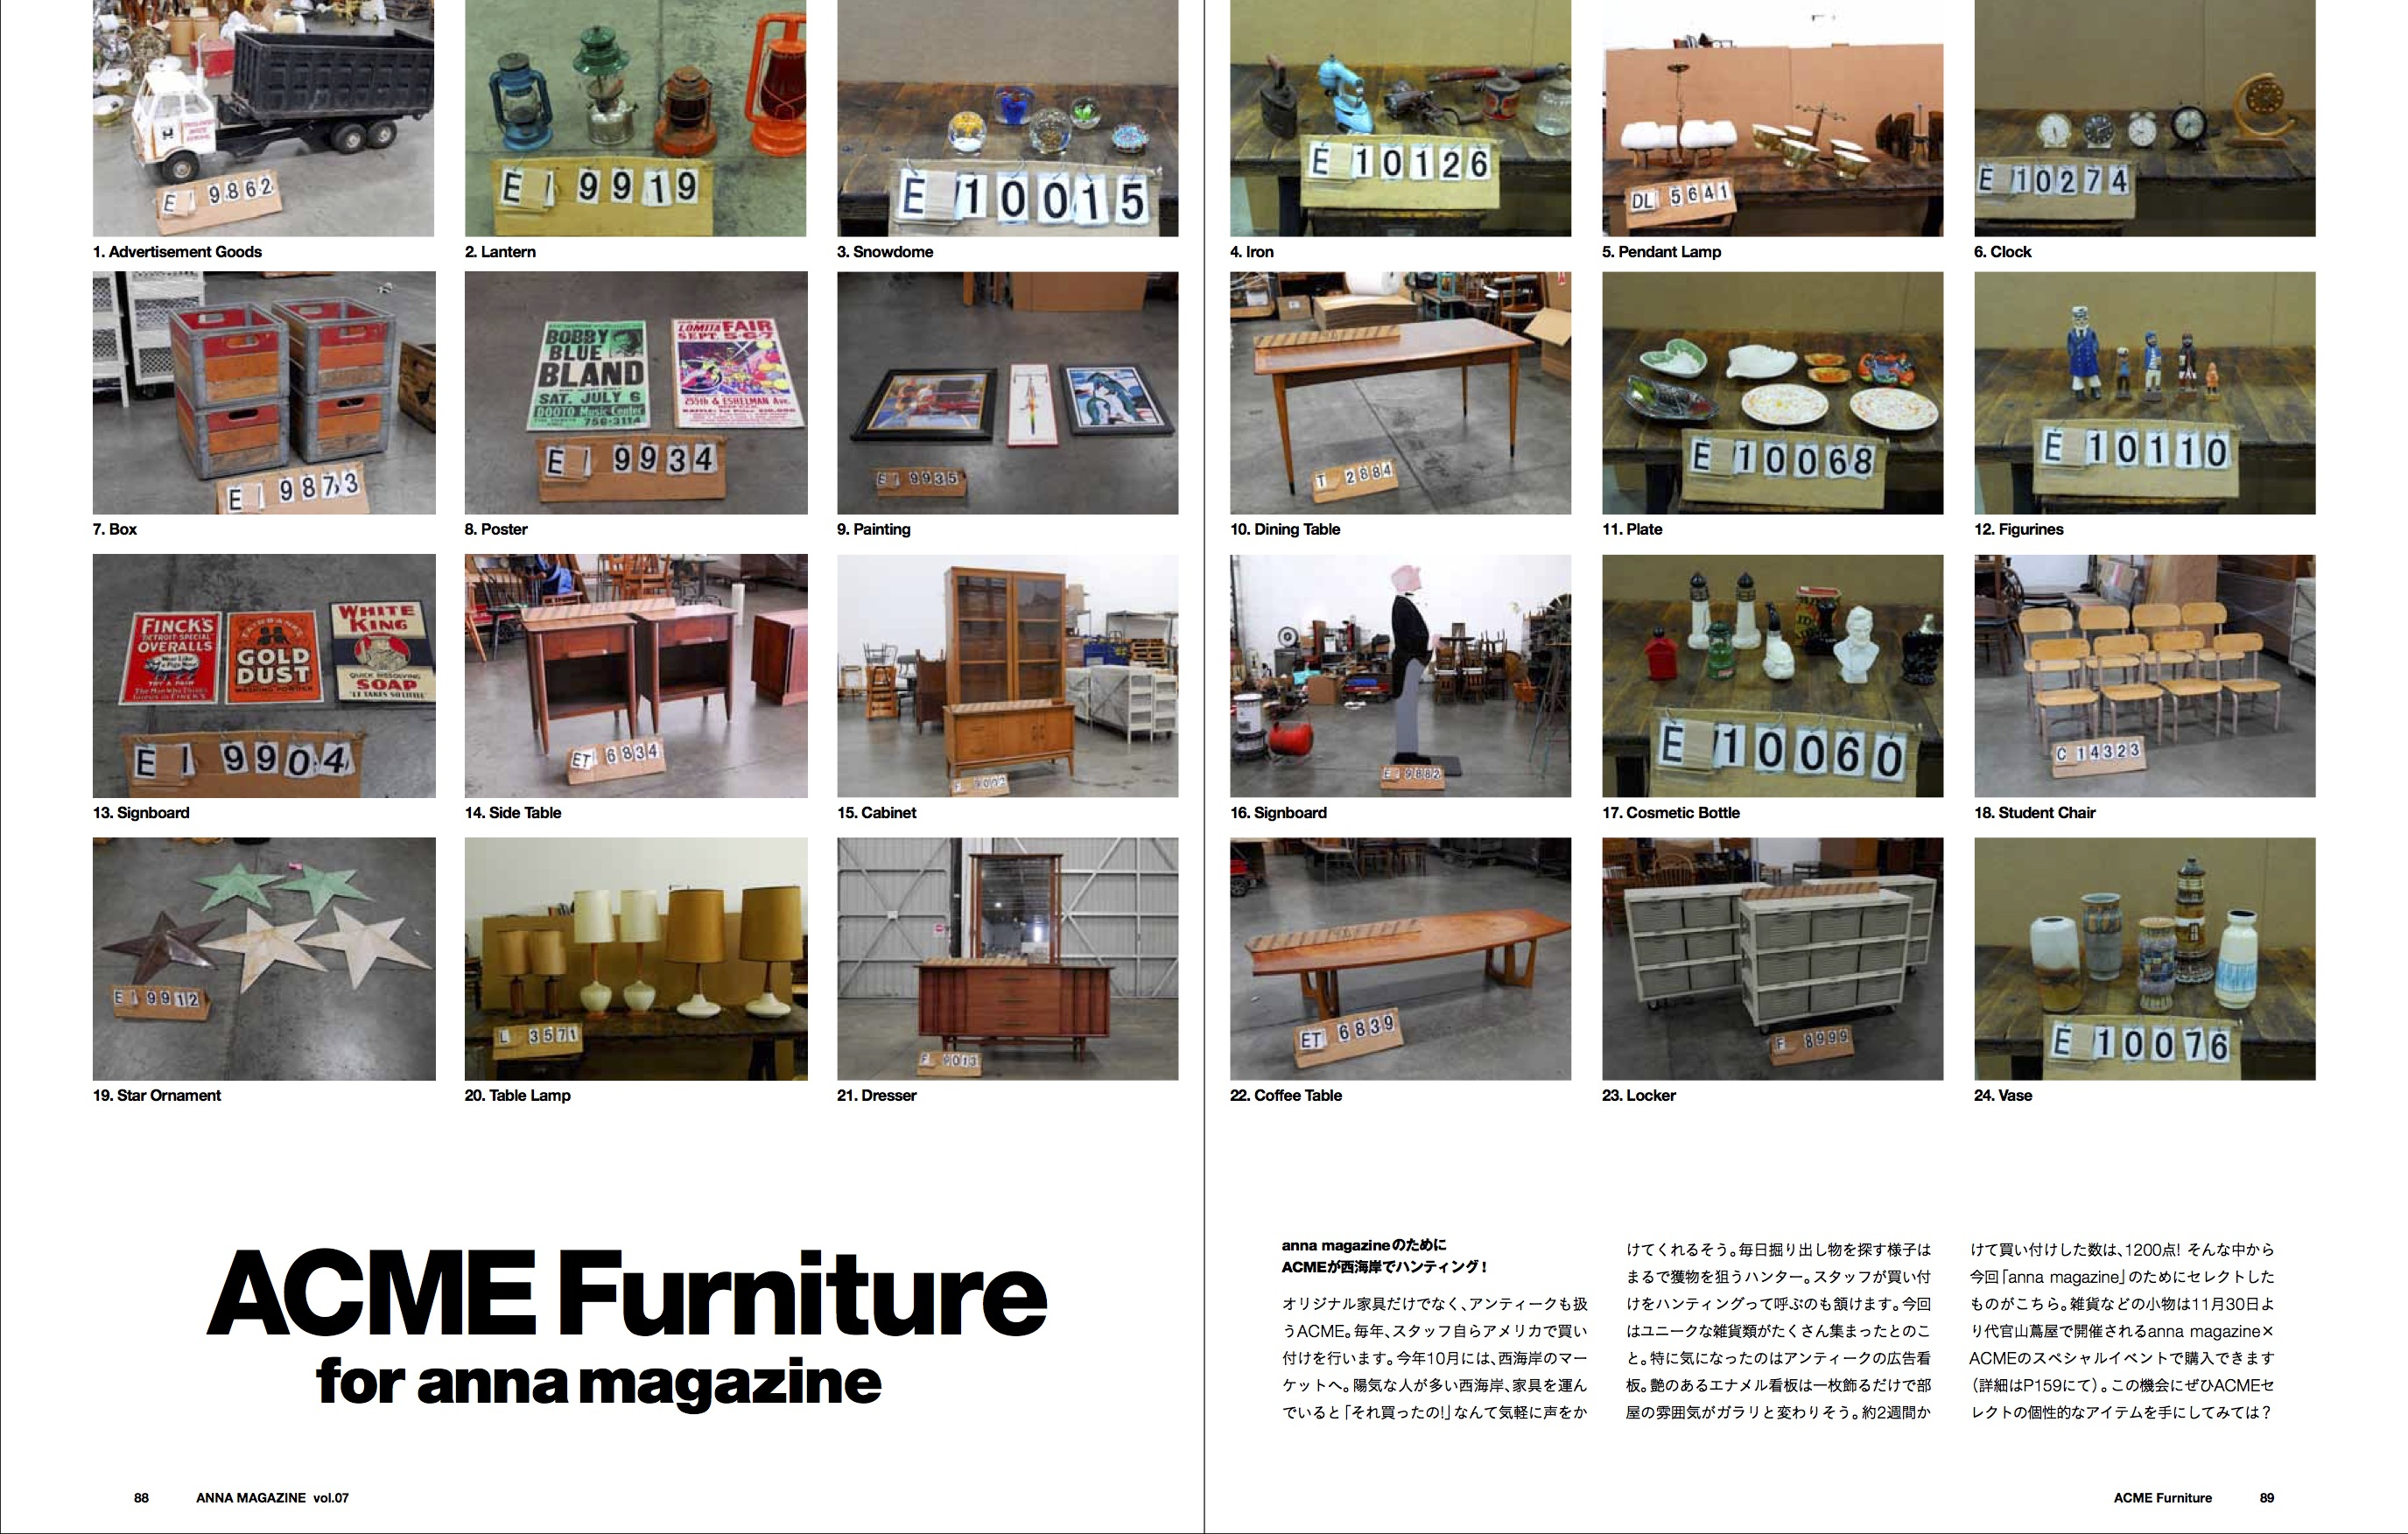 anna magazine vol.7 P25